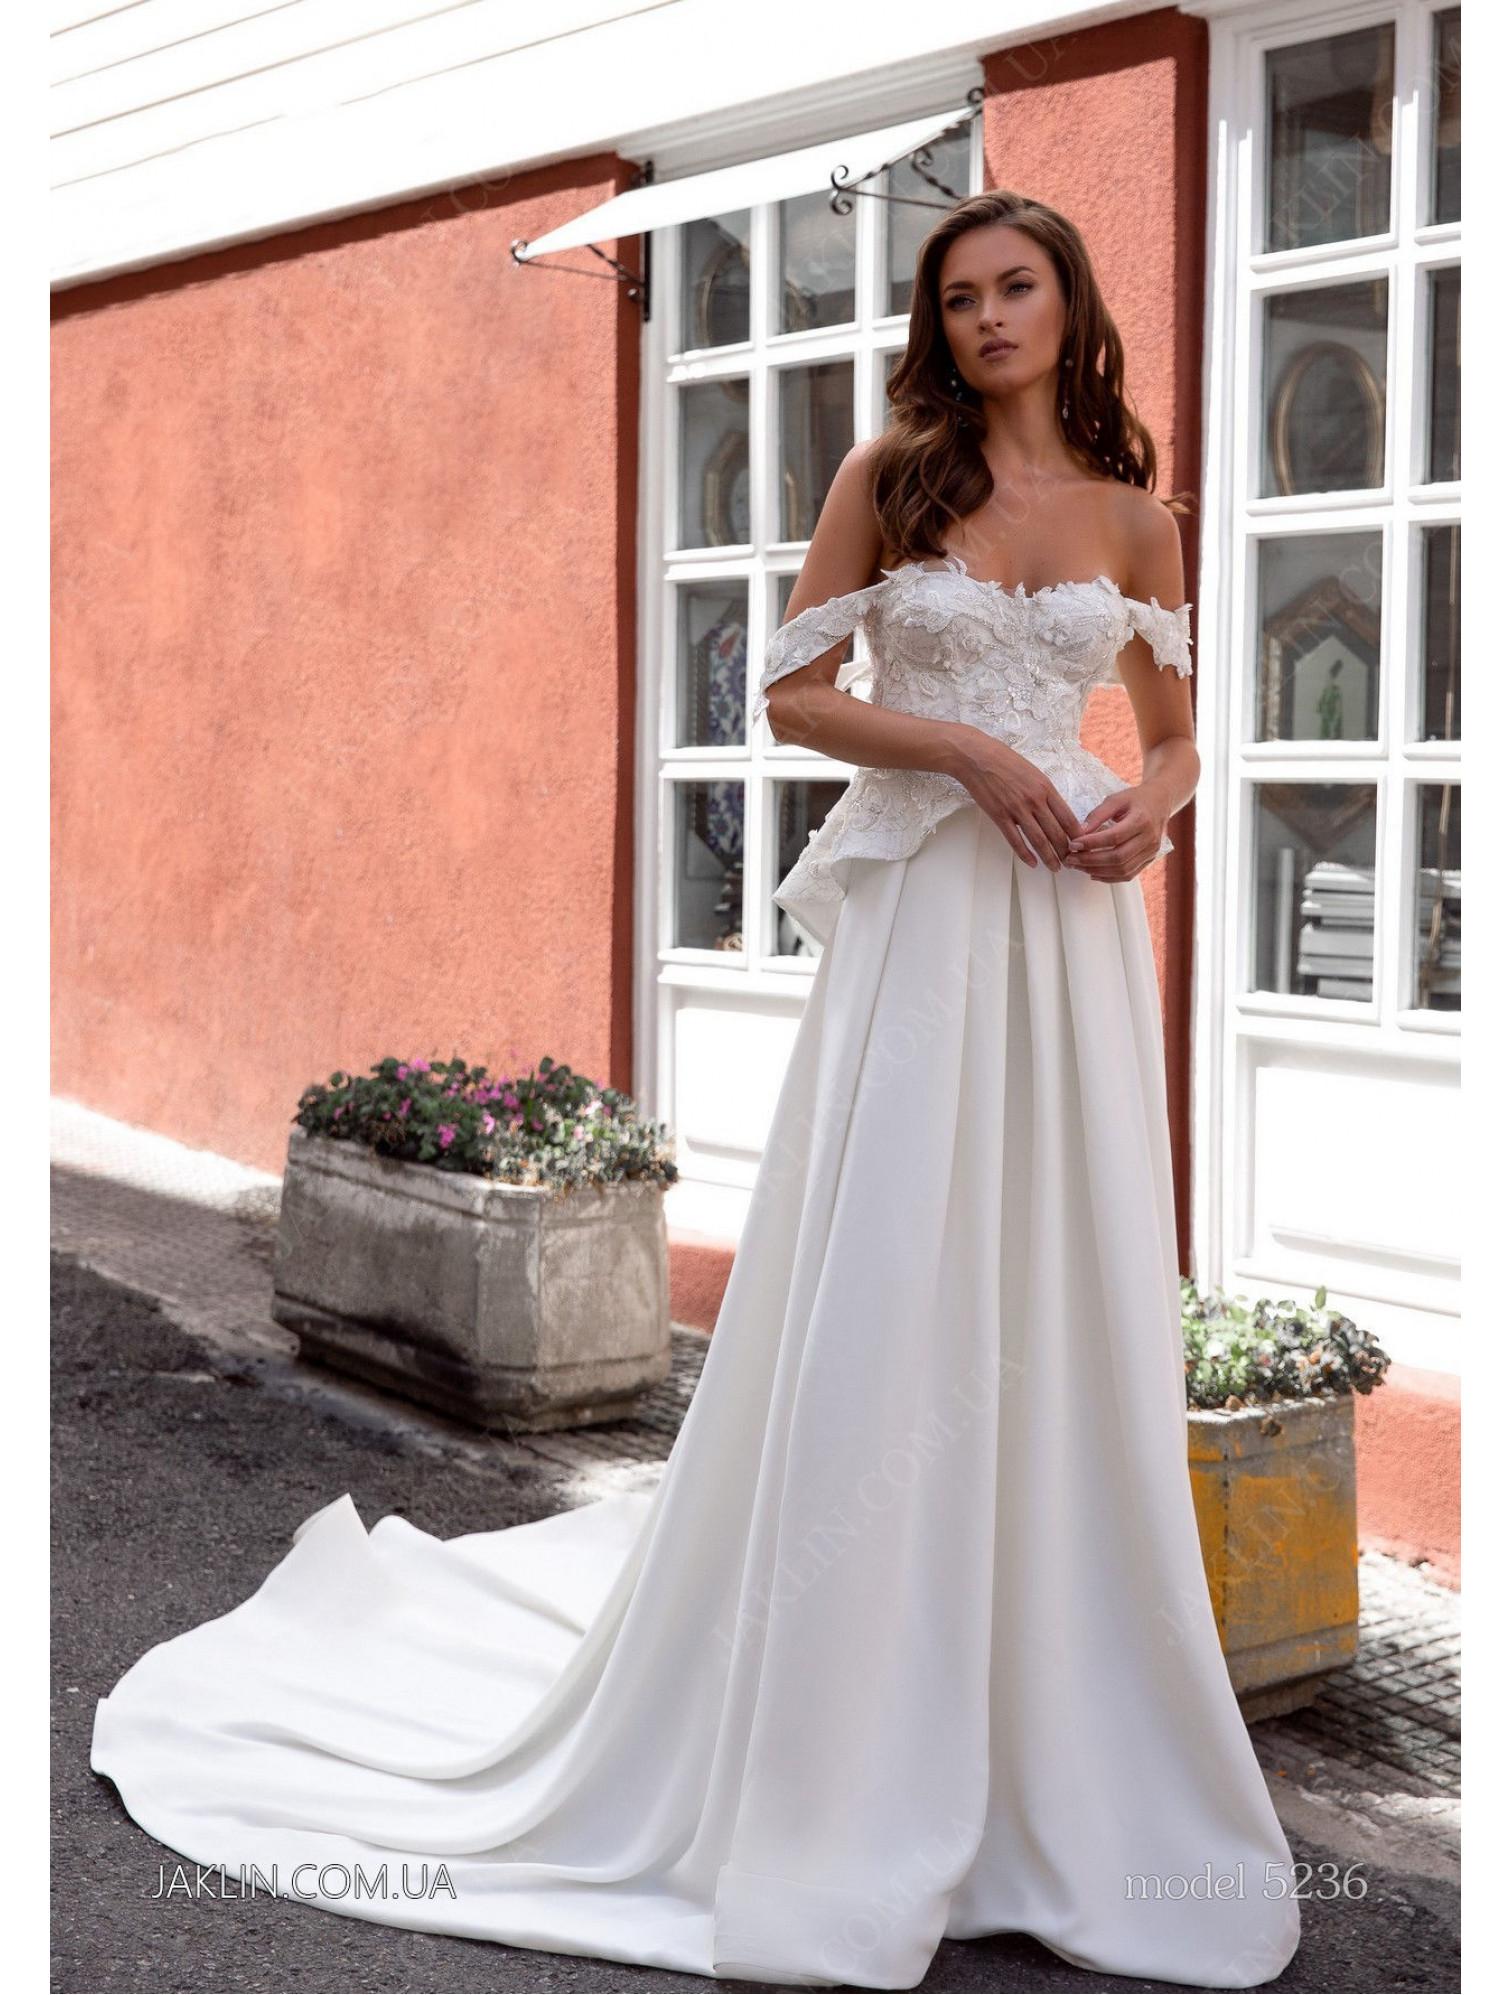 Wedding dress 5236